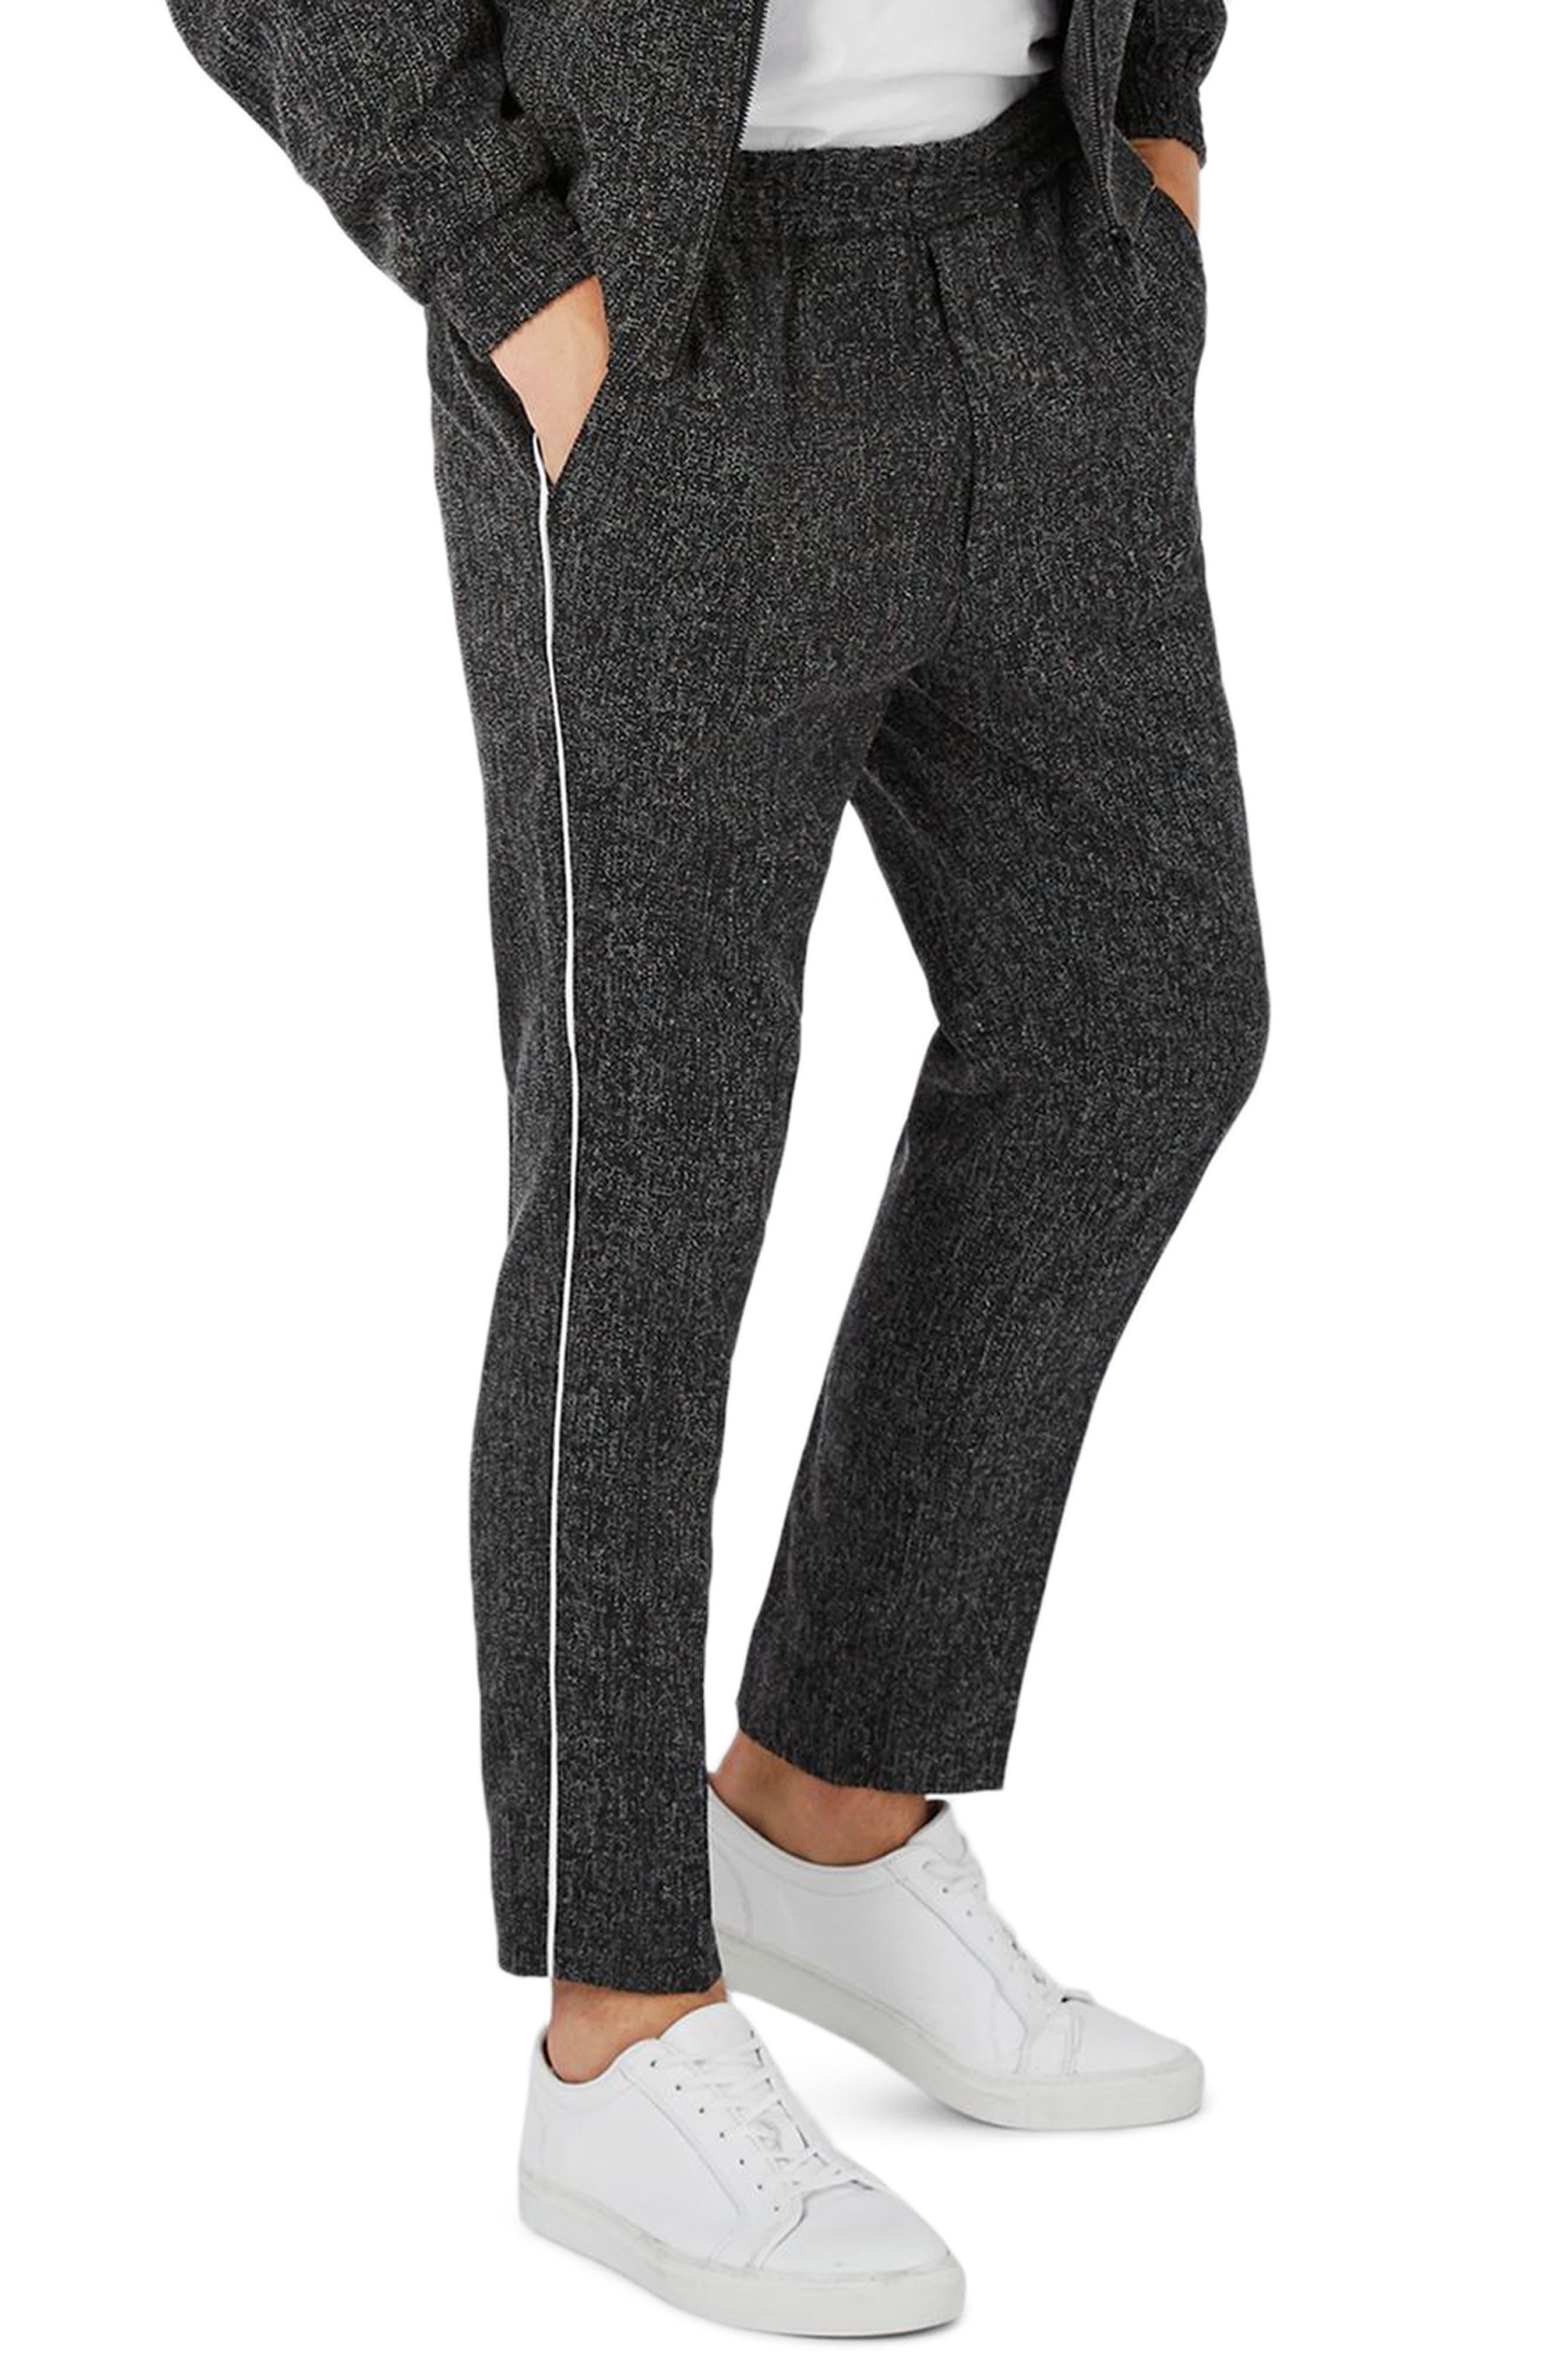 Kids Pipe and Moustache Boys Girls Sweatpants Active Jogger Pants Back Pocket Black